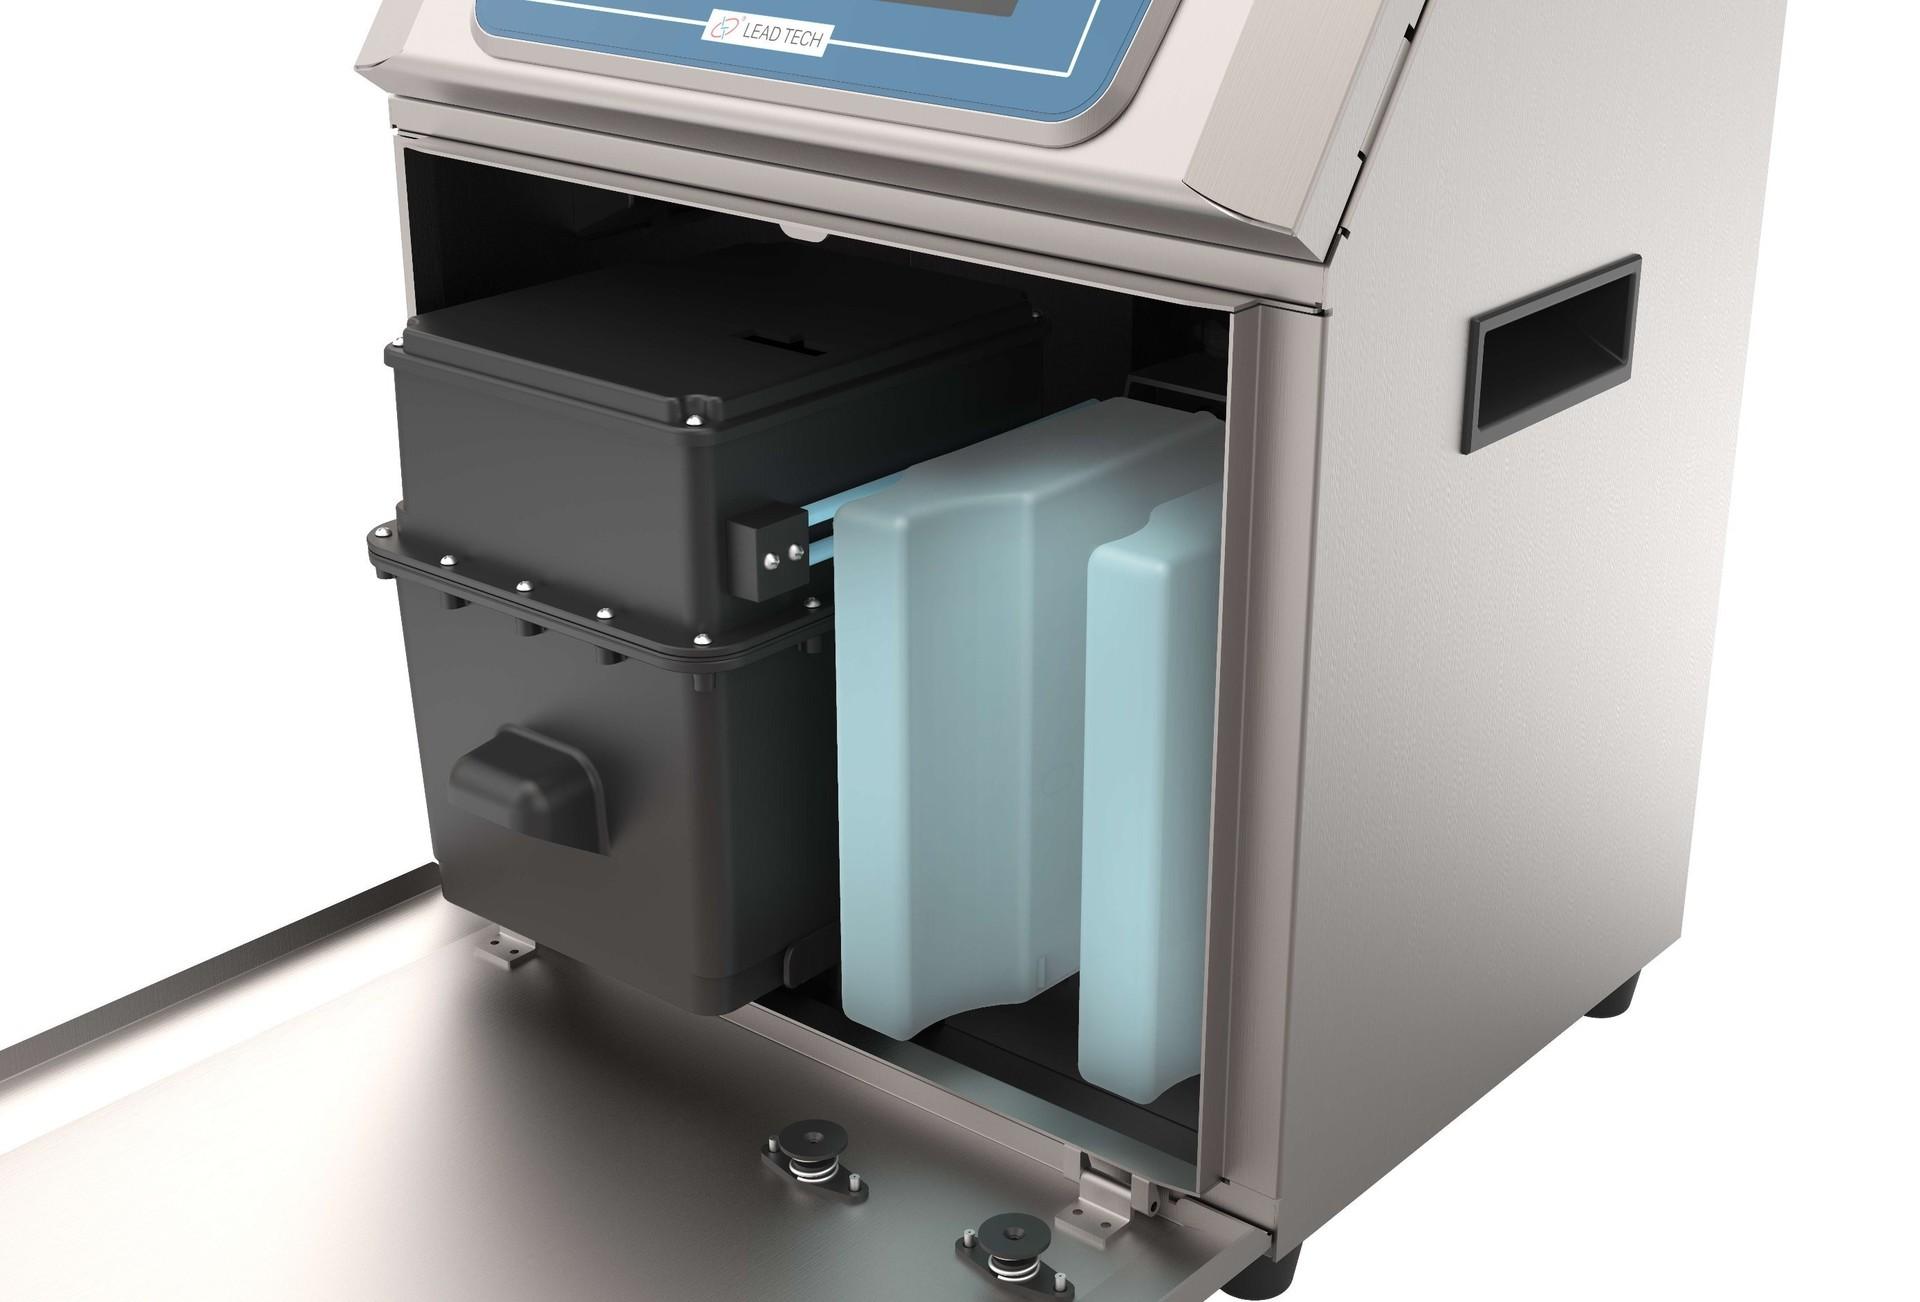 Lead Tech Lt800 Expiry Date Coding Machine Cij Inkjet Printer